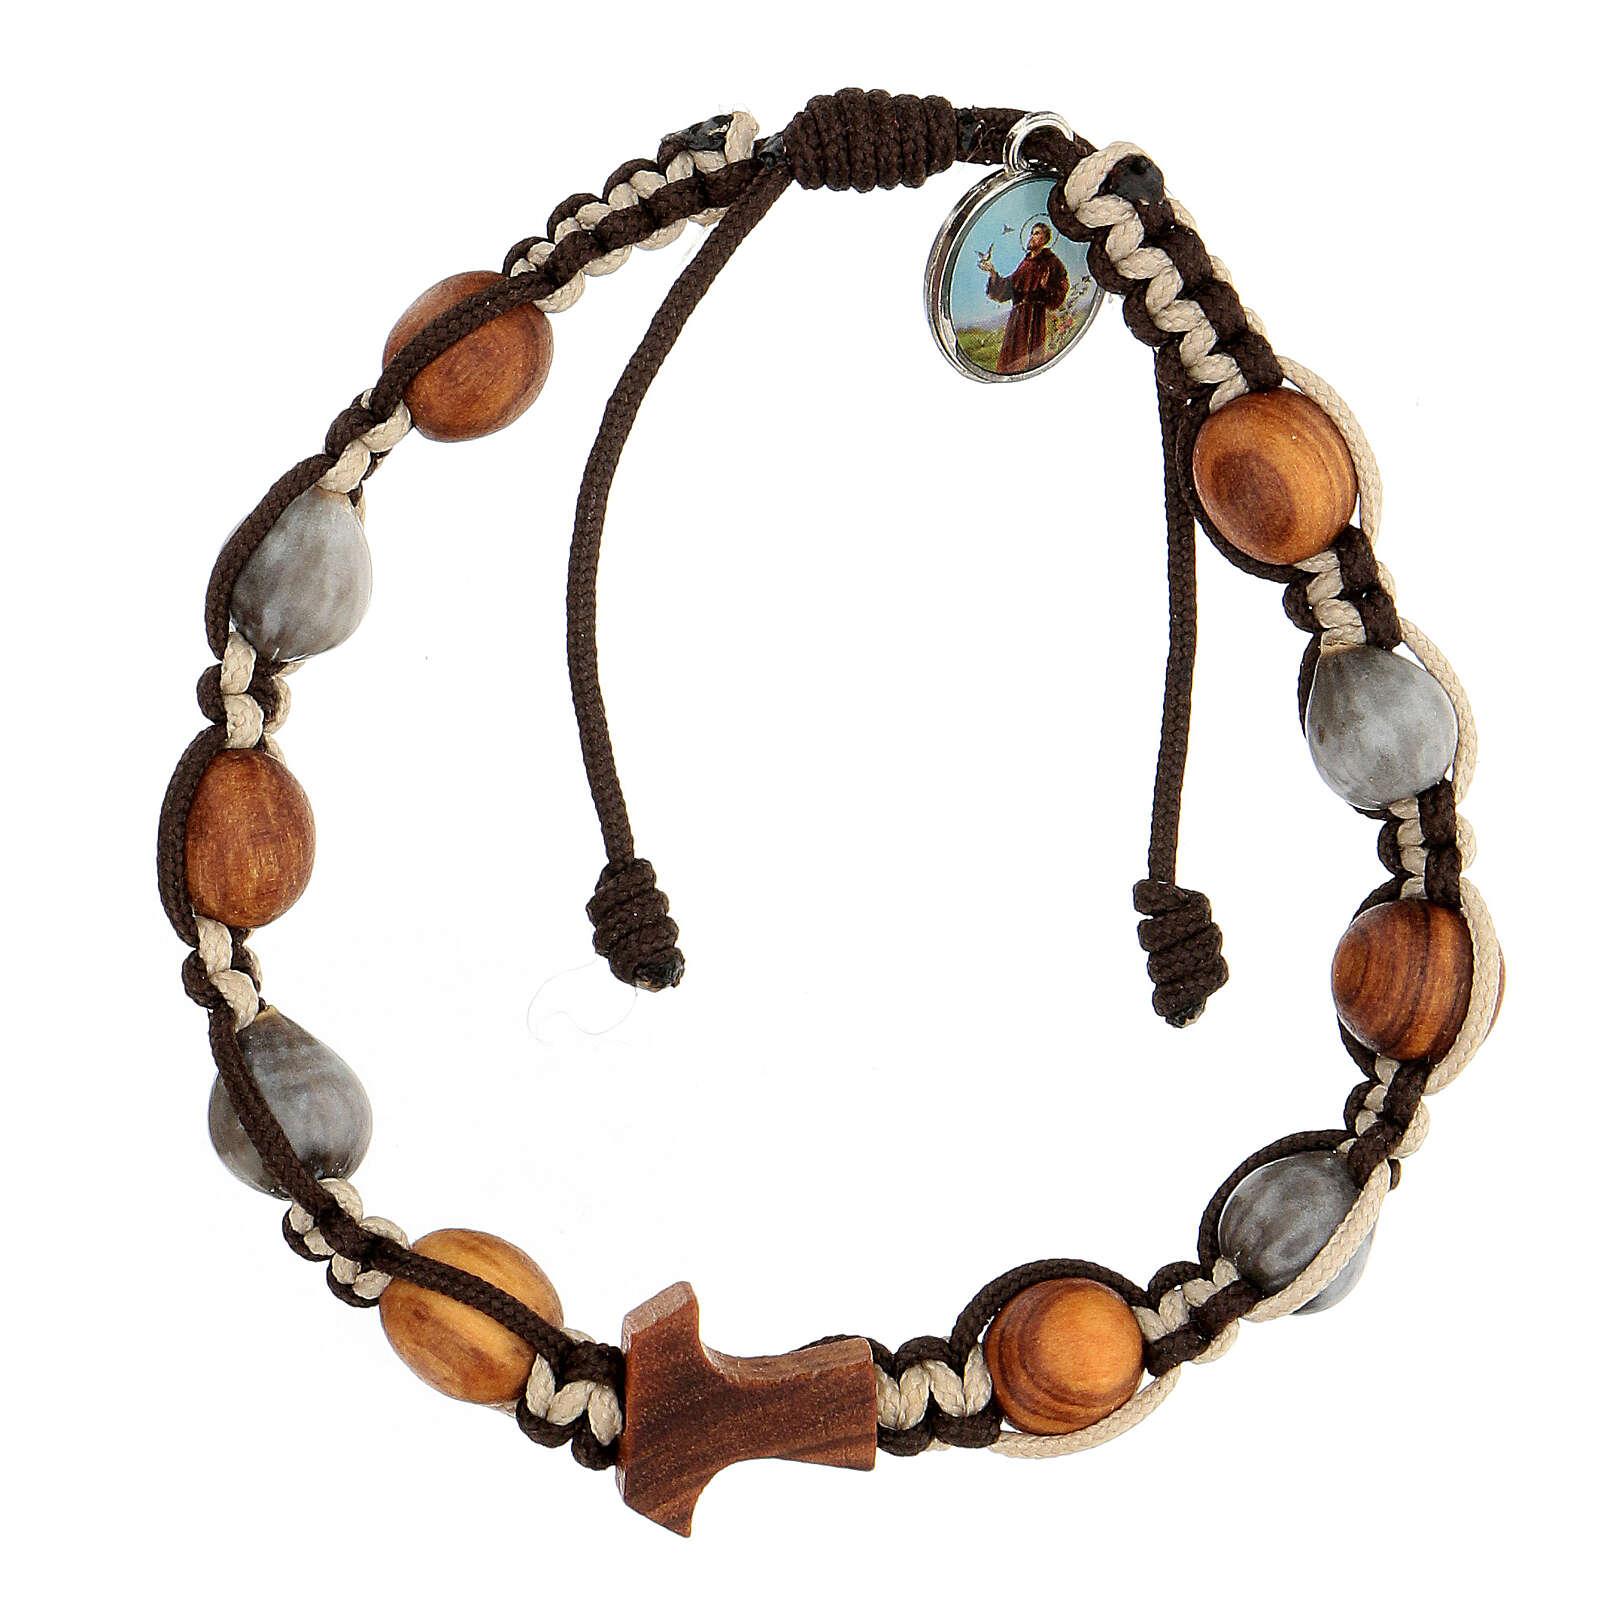 Bracelet Medjugorje grains ronds corde bicolore Larmes-de-Job 4